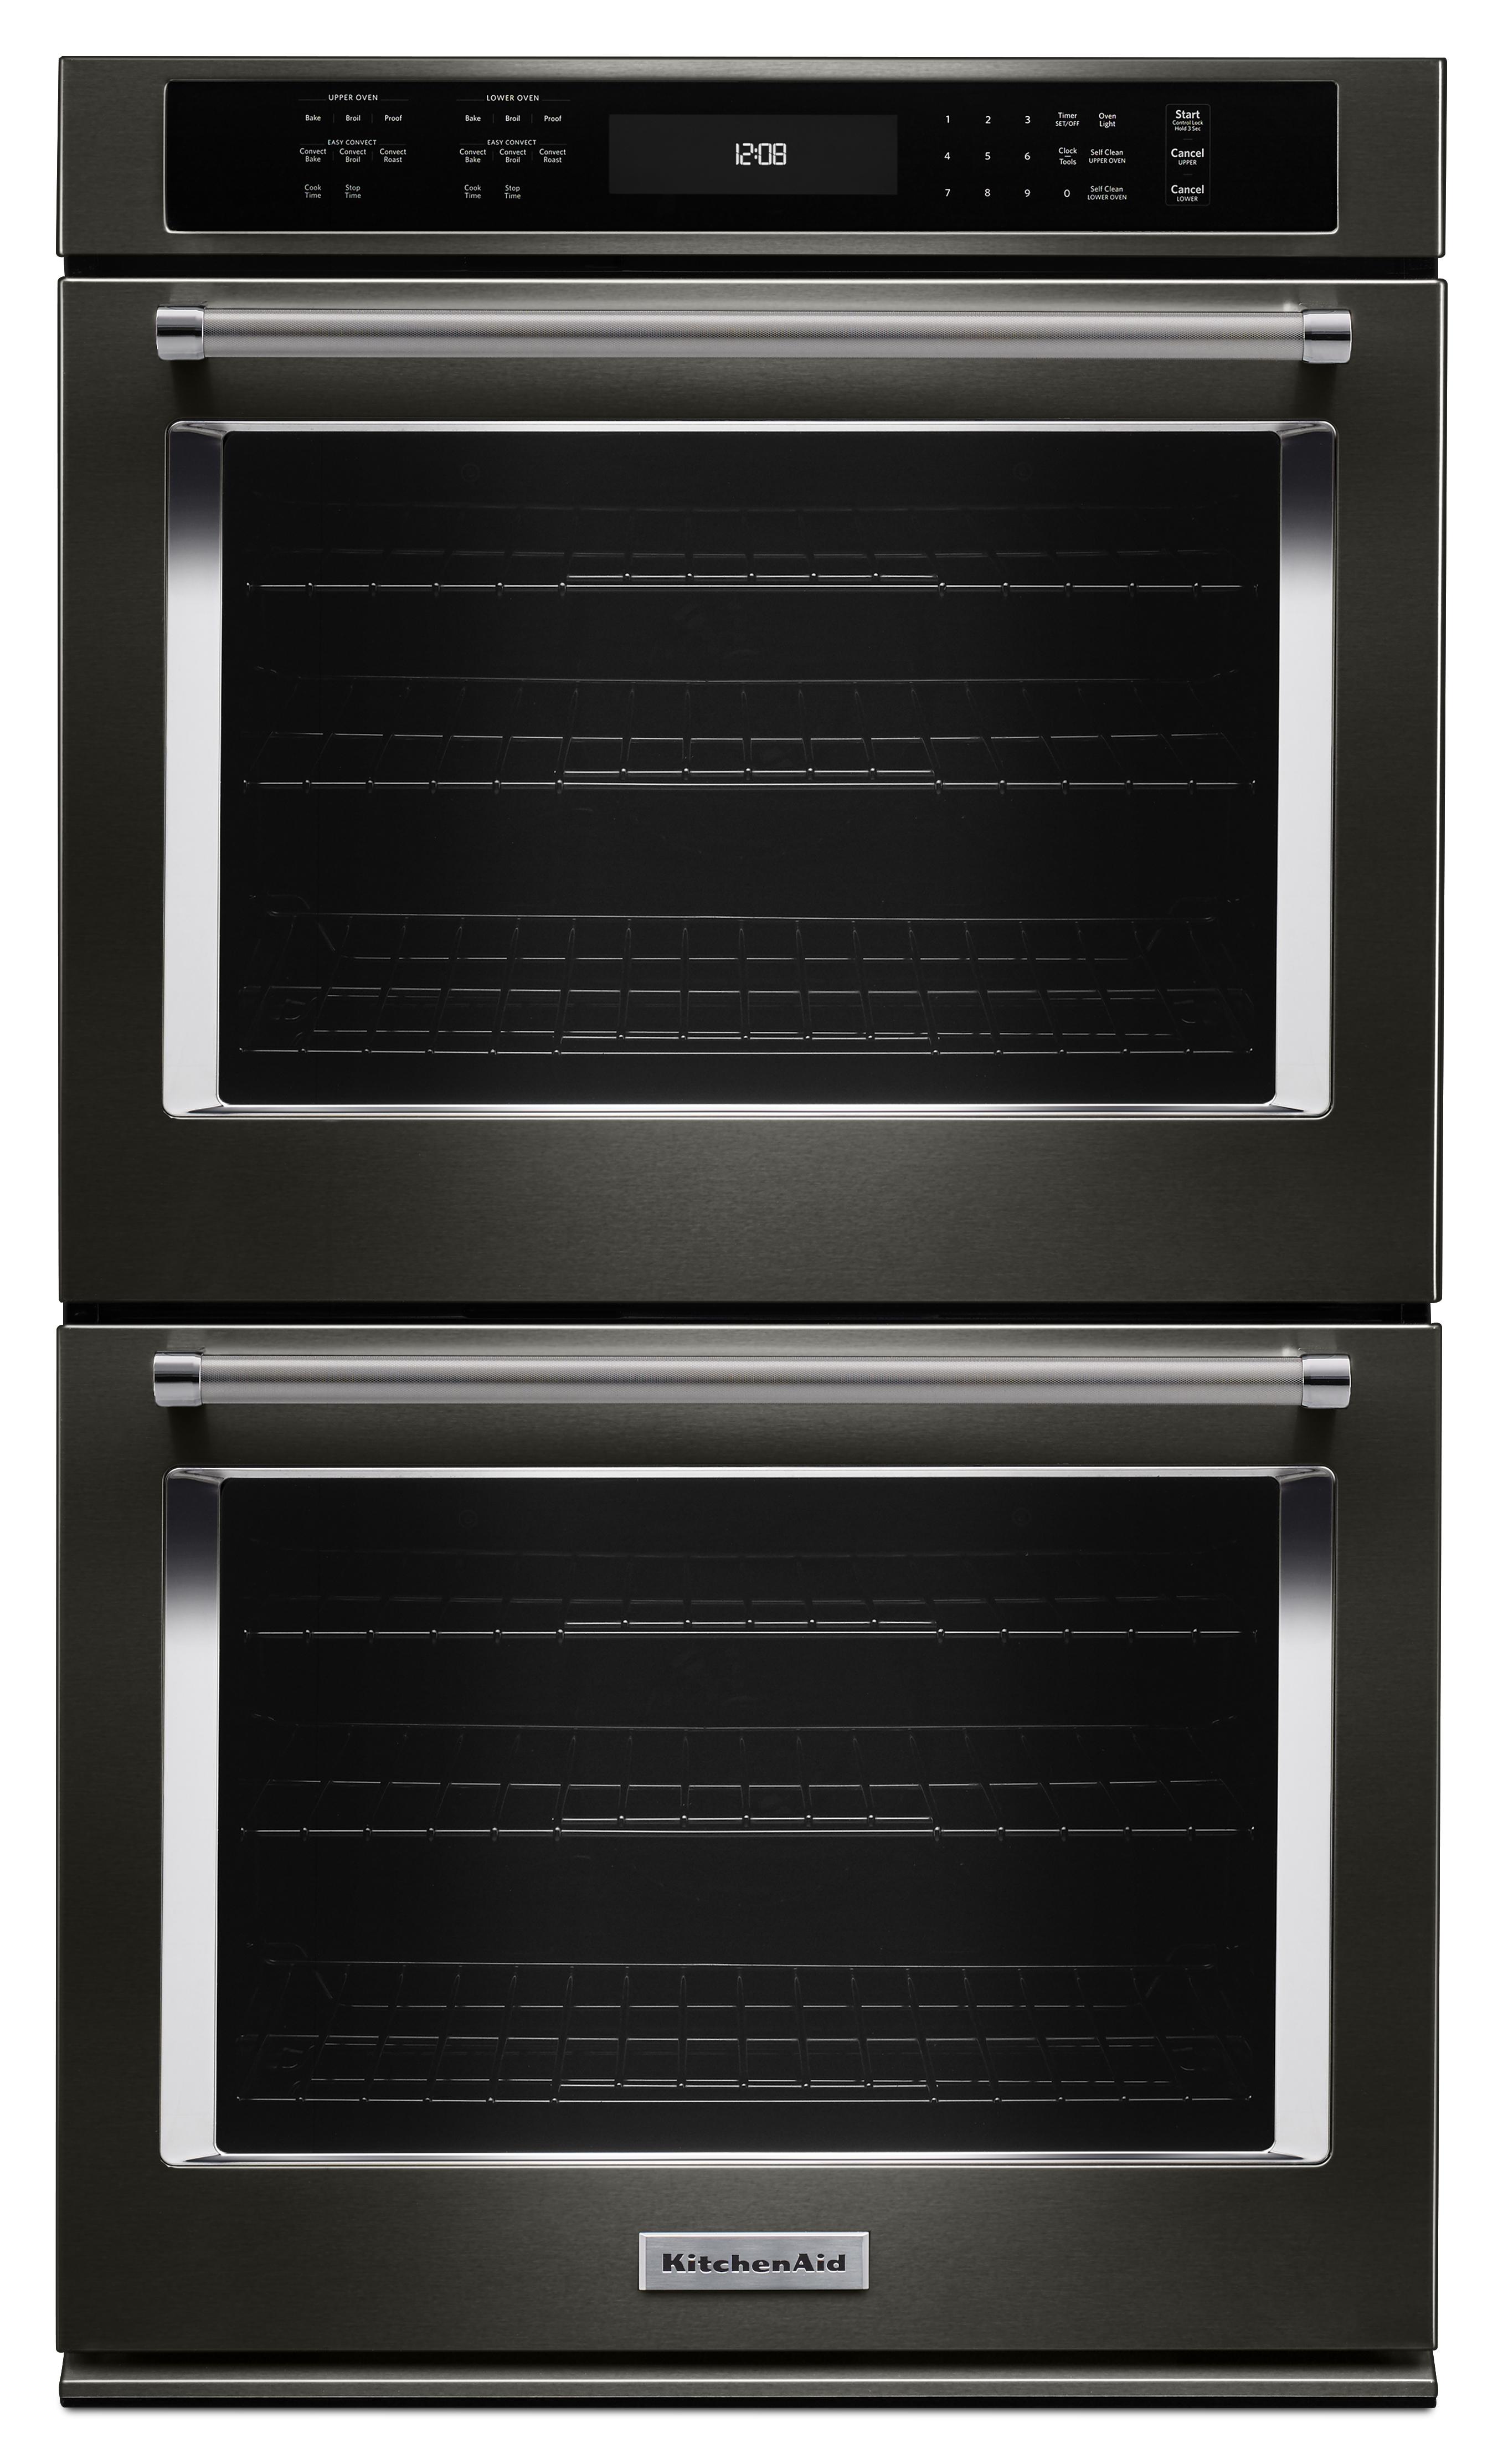 KitchenAid KODE507EBS 27 Double Wall Oven w EvenHeat